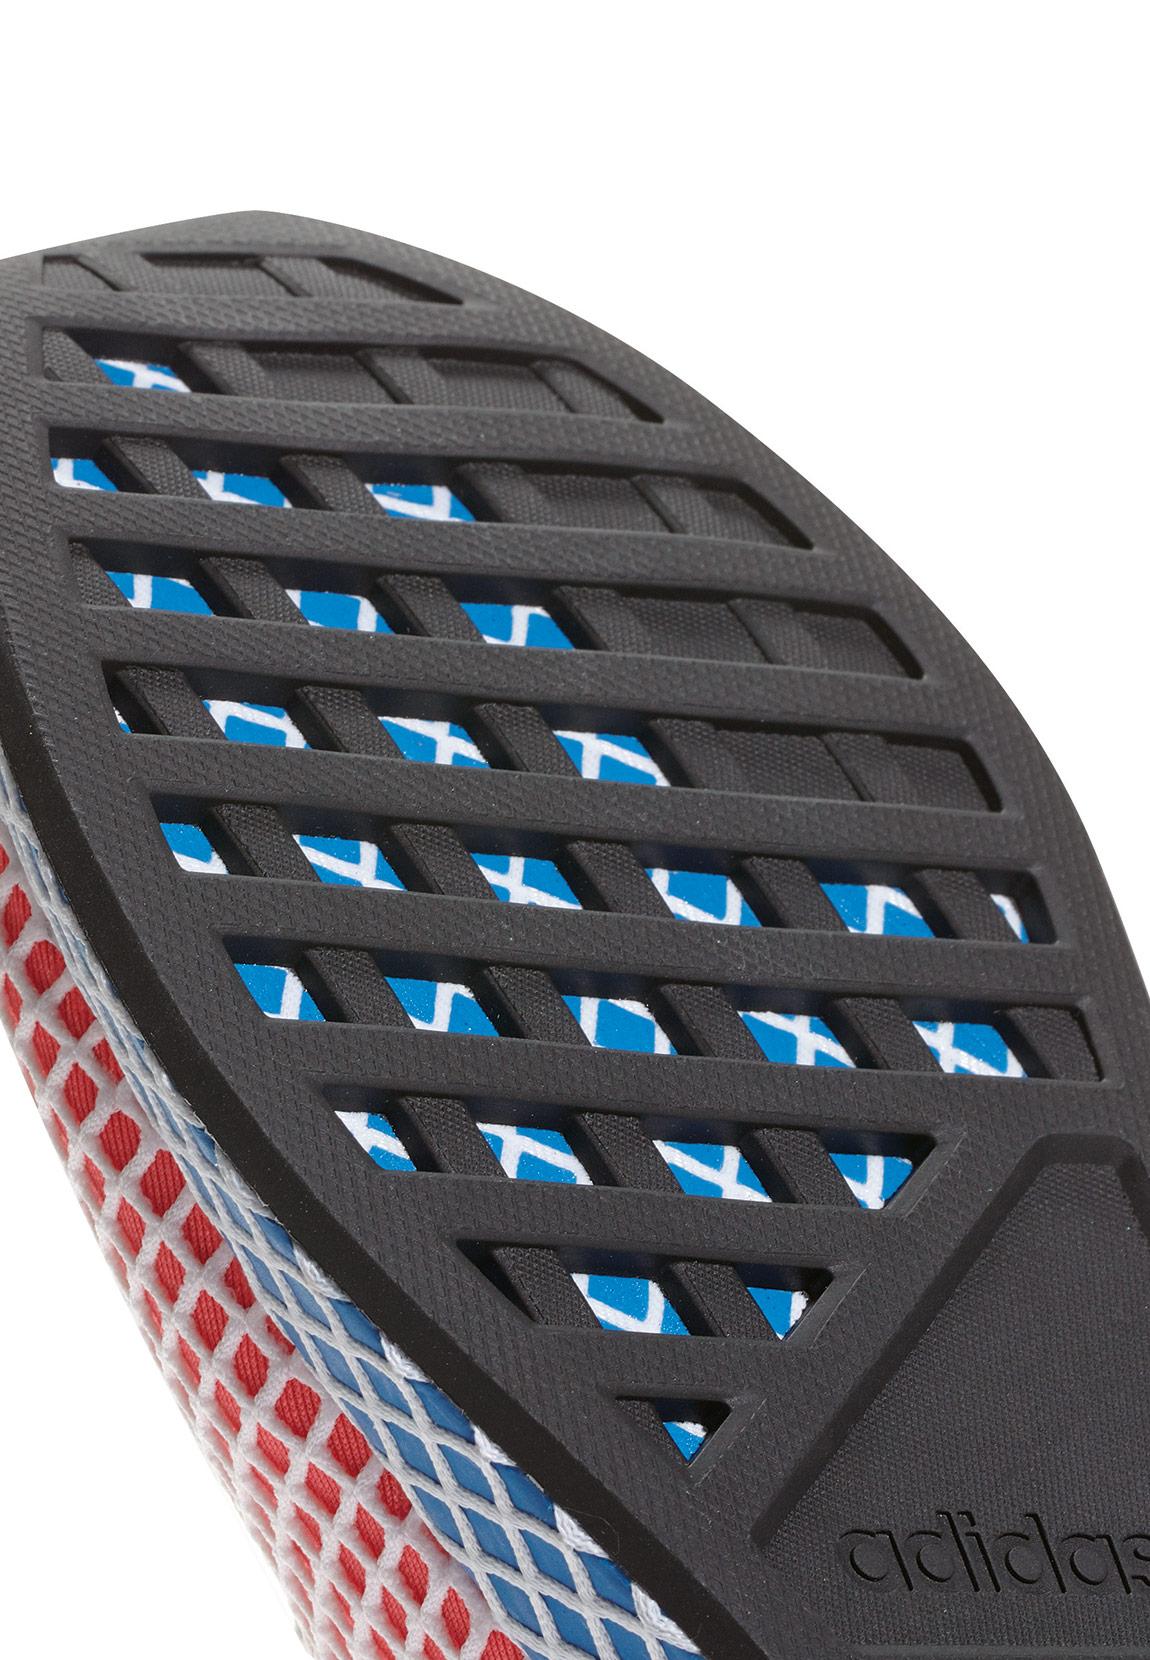 on sale d64b5 ce2eb Fabricant Adidas Originals